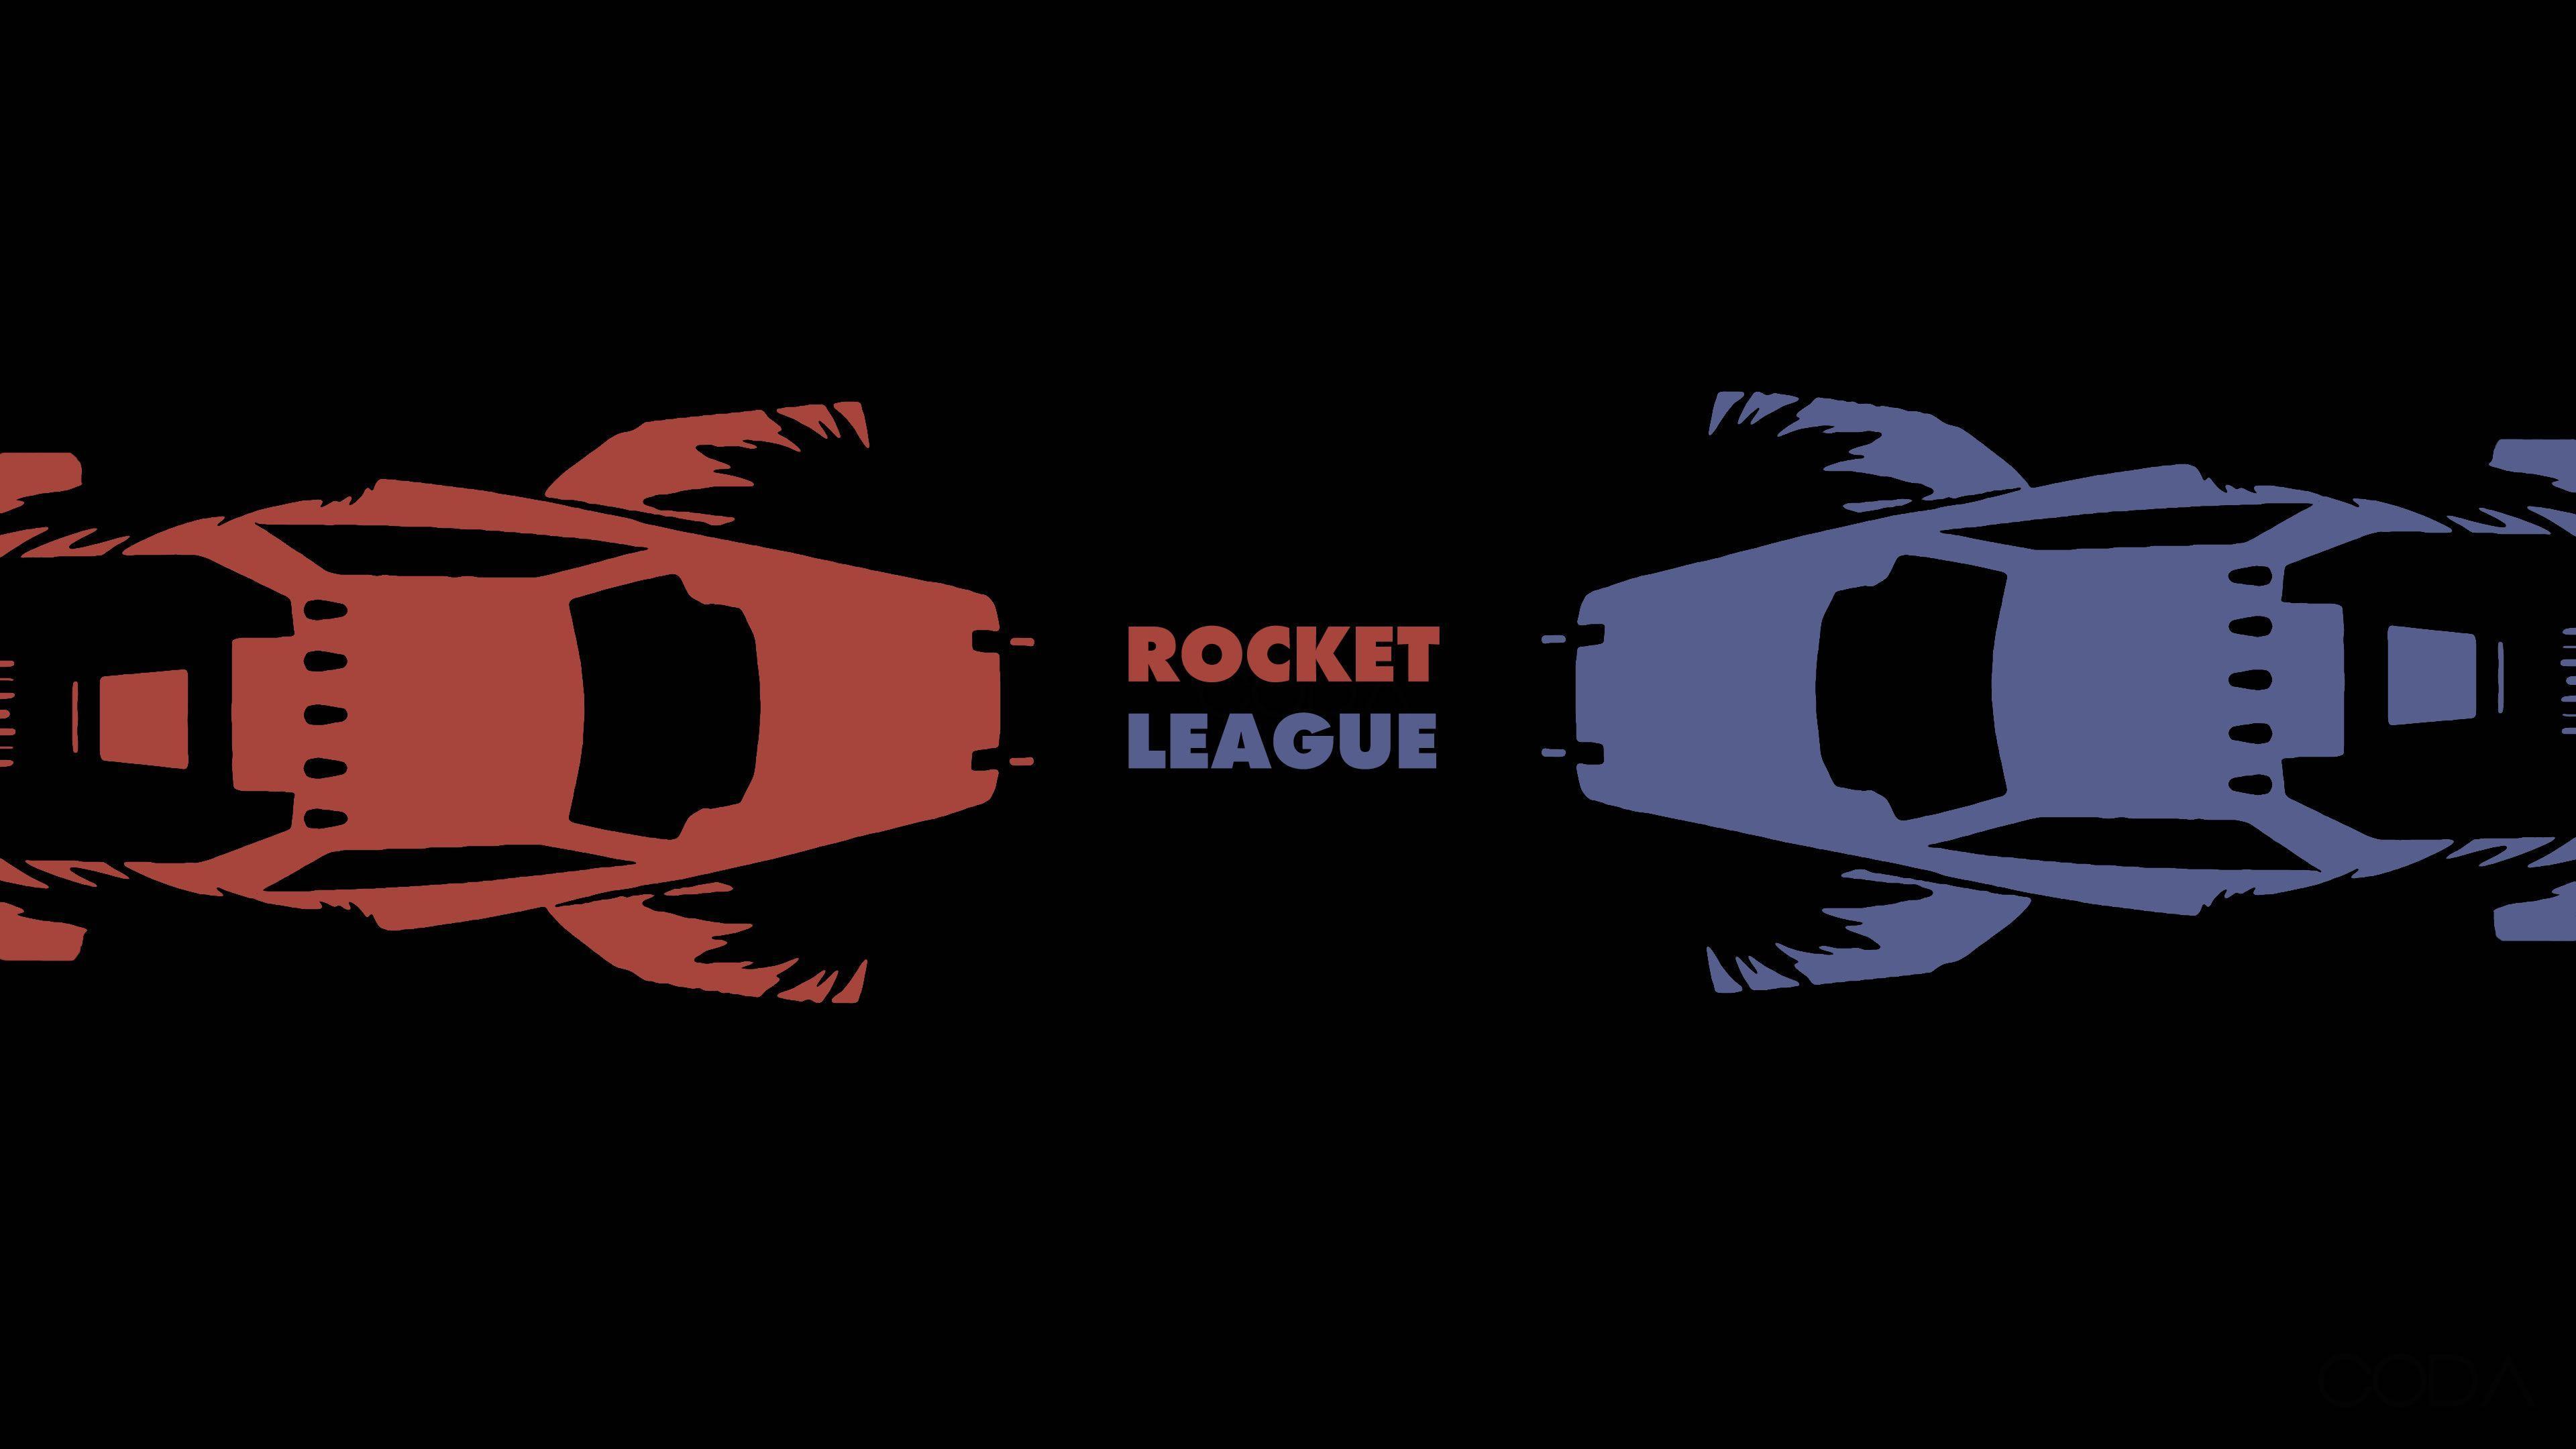 Rocket League Wallpapers - Wallpaper Cave